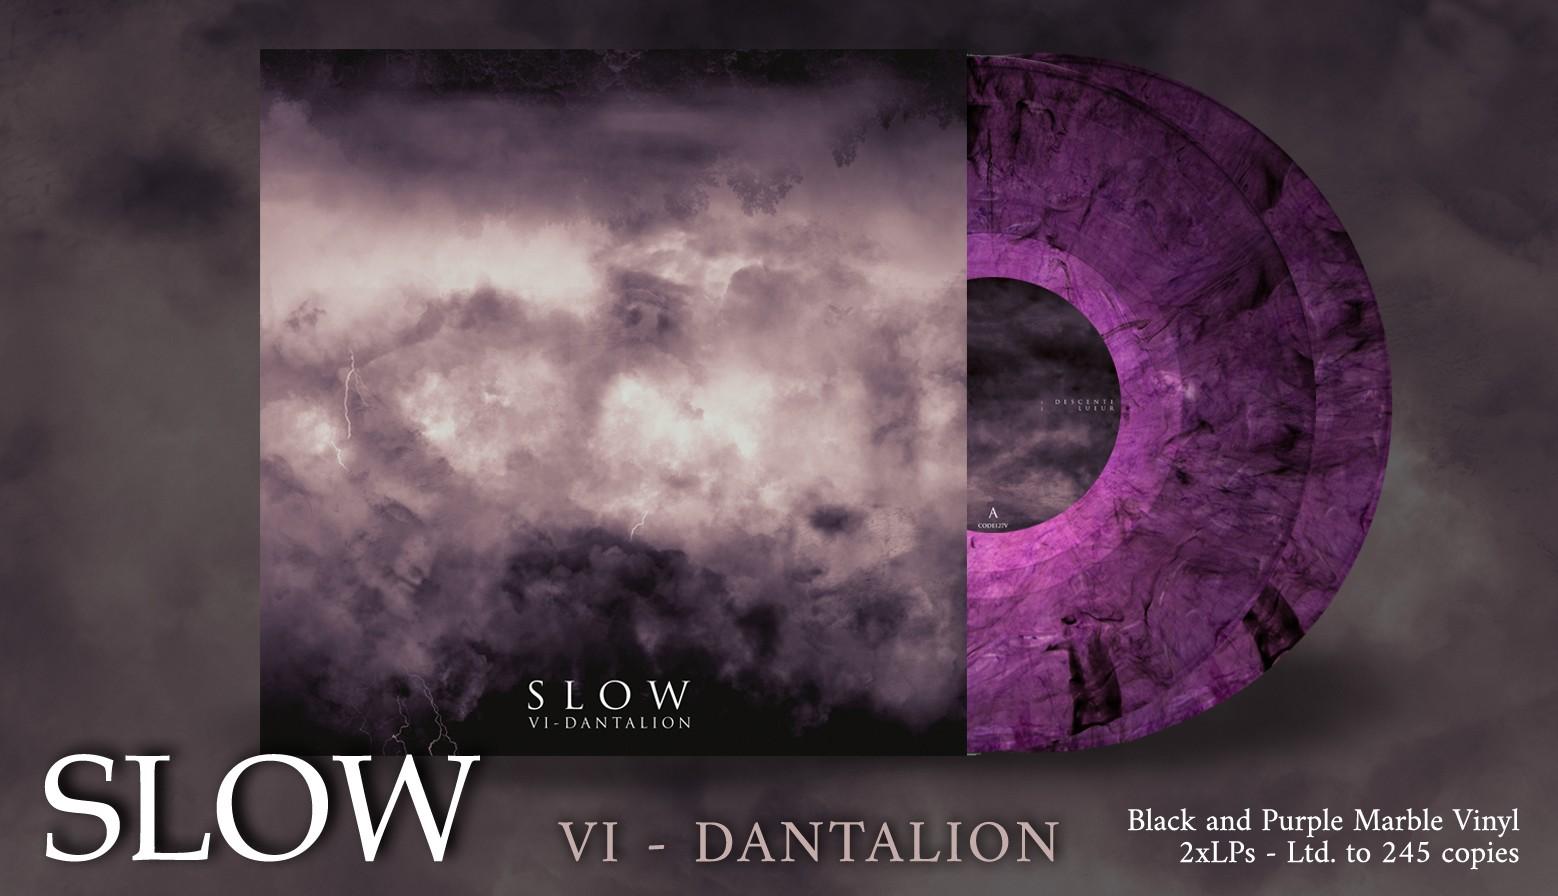 Slow Dantalion vinyl